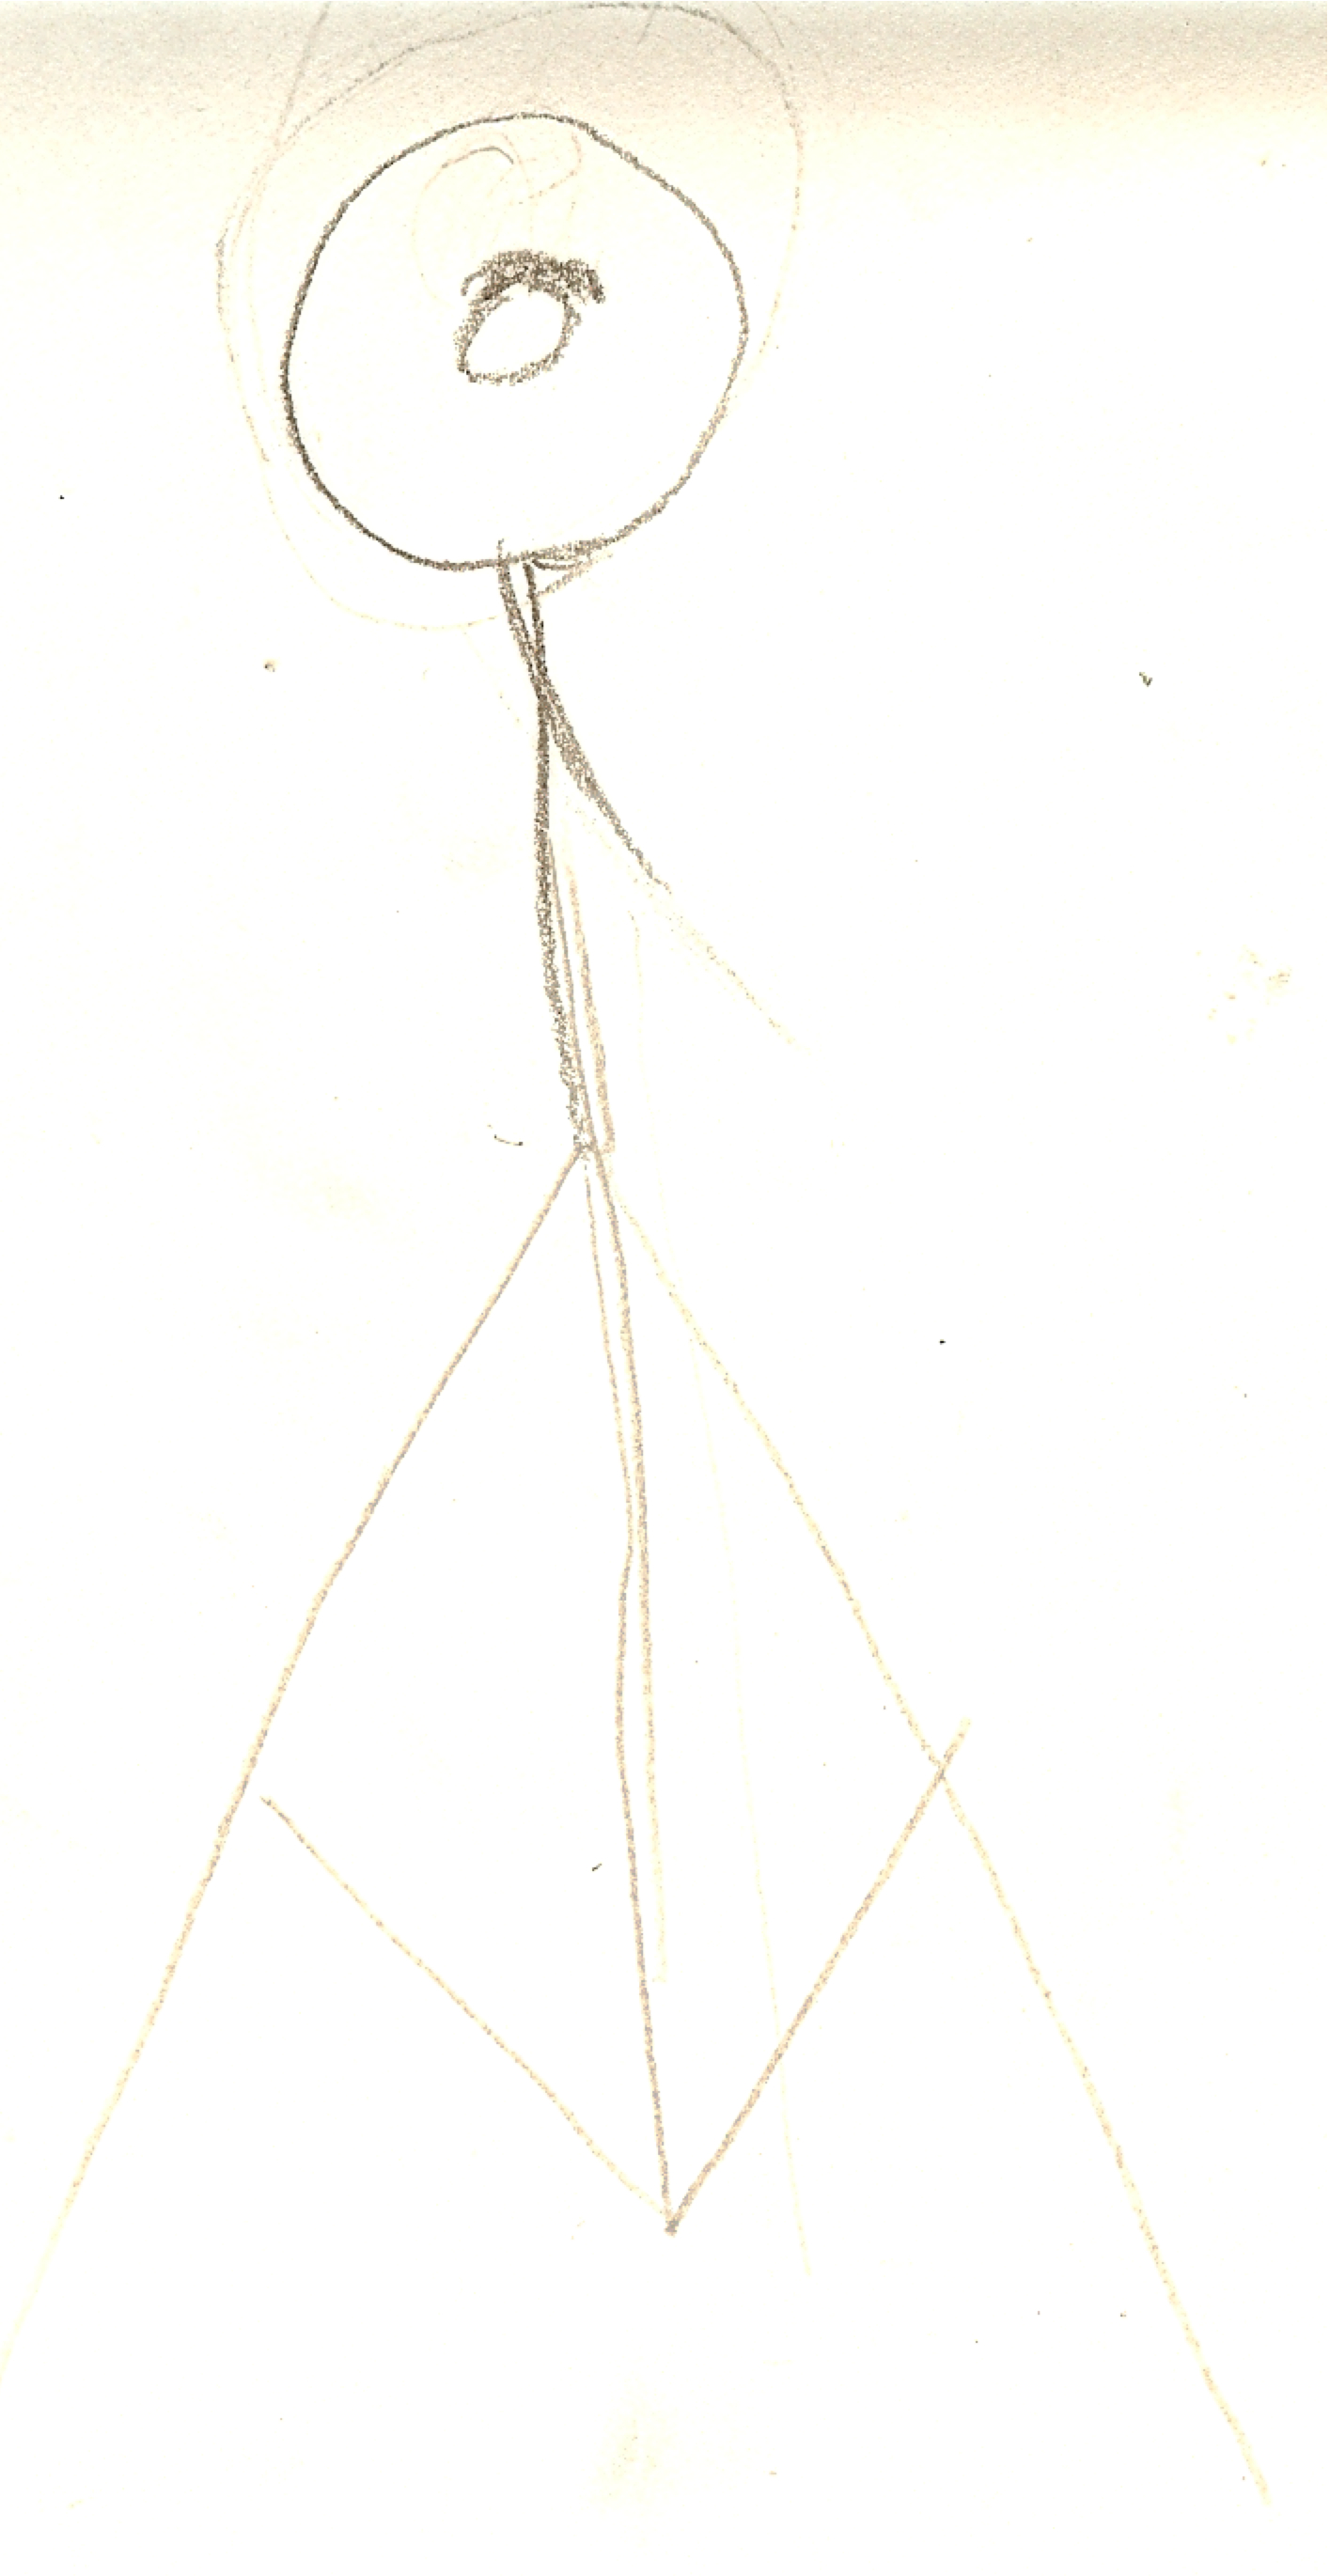 Line Drawing Javascript : Contour line drawings upwardboundartists